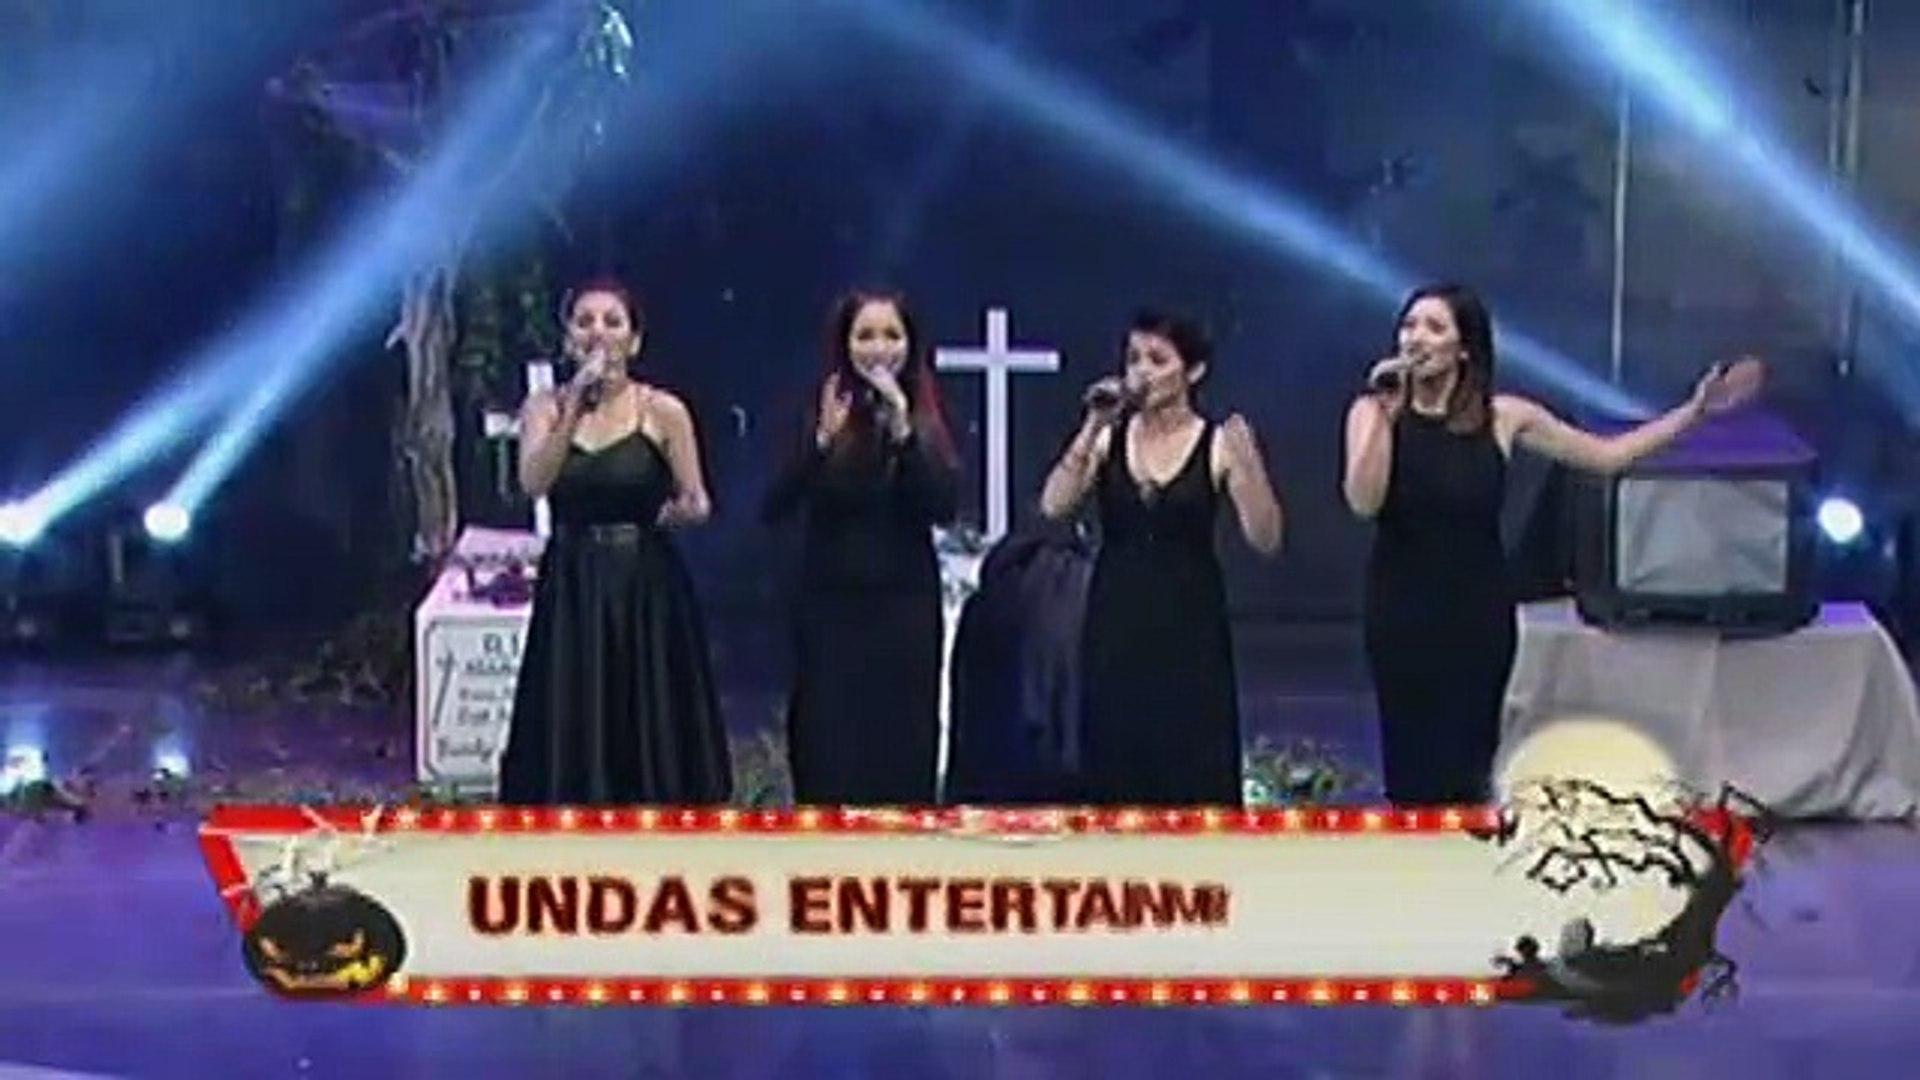 Undas Entertainment